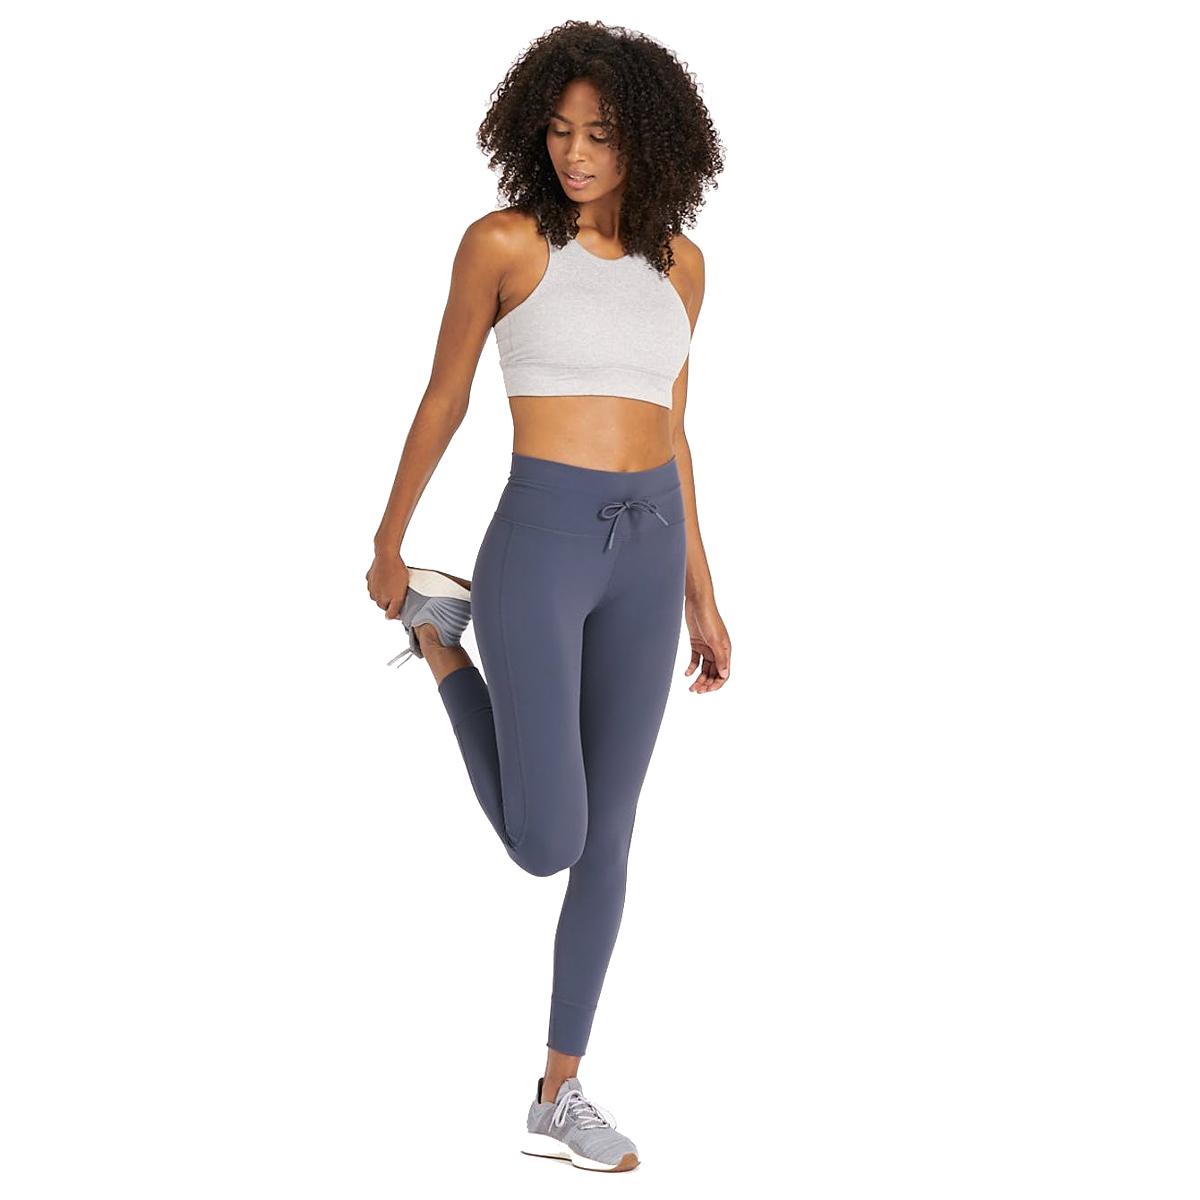 Women's Vuori Daily Legging  - Color: Ocean - Size: M, Ocean, large, image 4